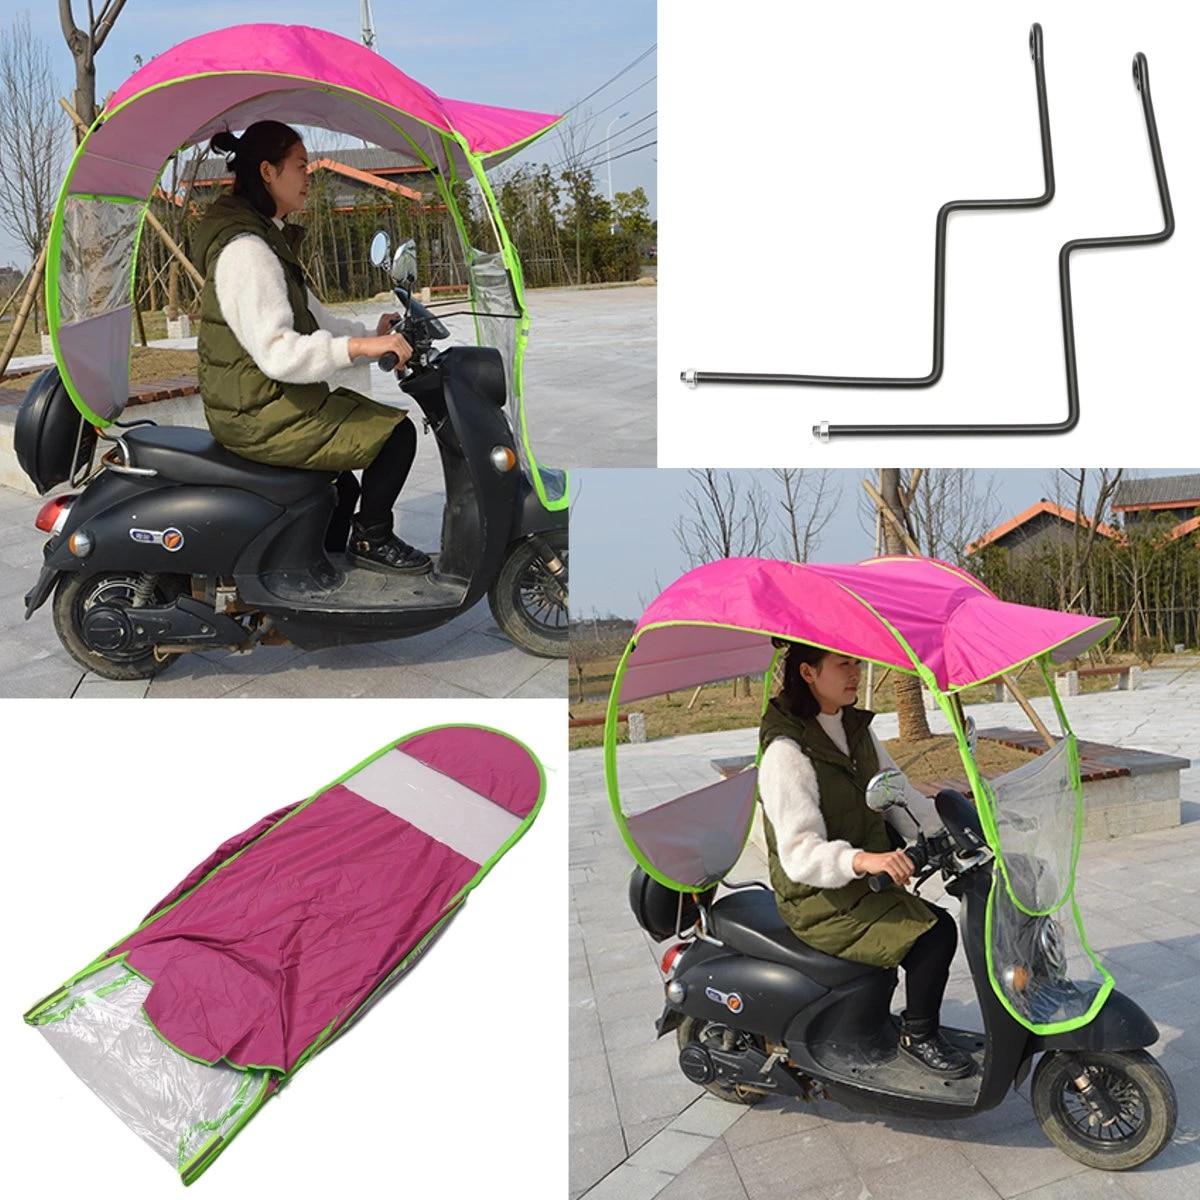 2.8*0.8*0.7M Motorbike Scooter Rain Cover Motorcycle Electric Sun Shade  Vehicle Umbrella Raincoat Poncho Cover Shelter|Motorcycle Rider Raincoat| -  AliExpress